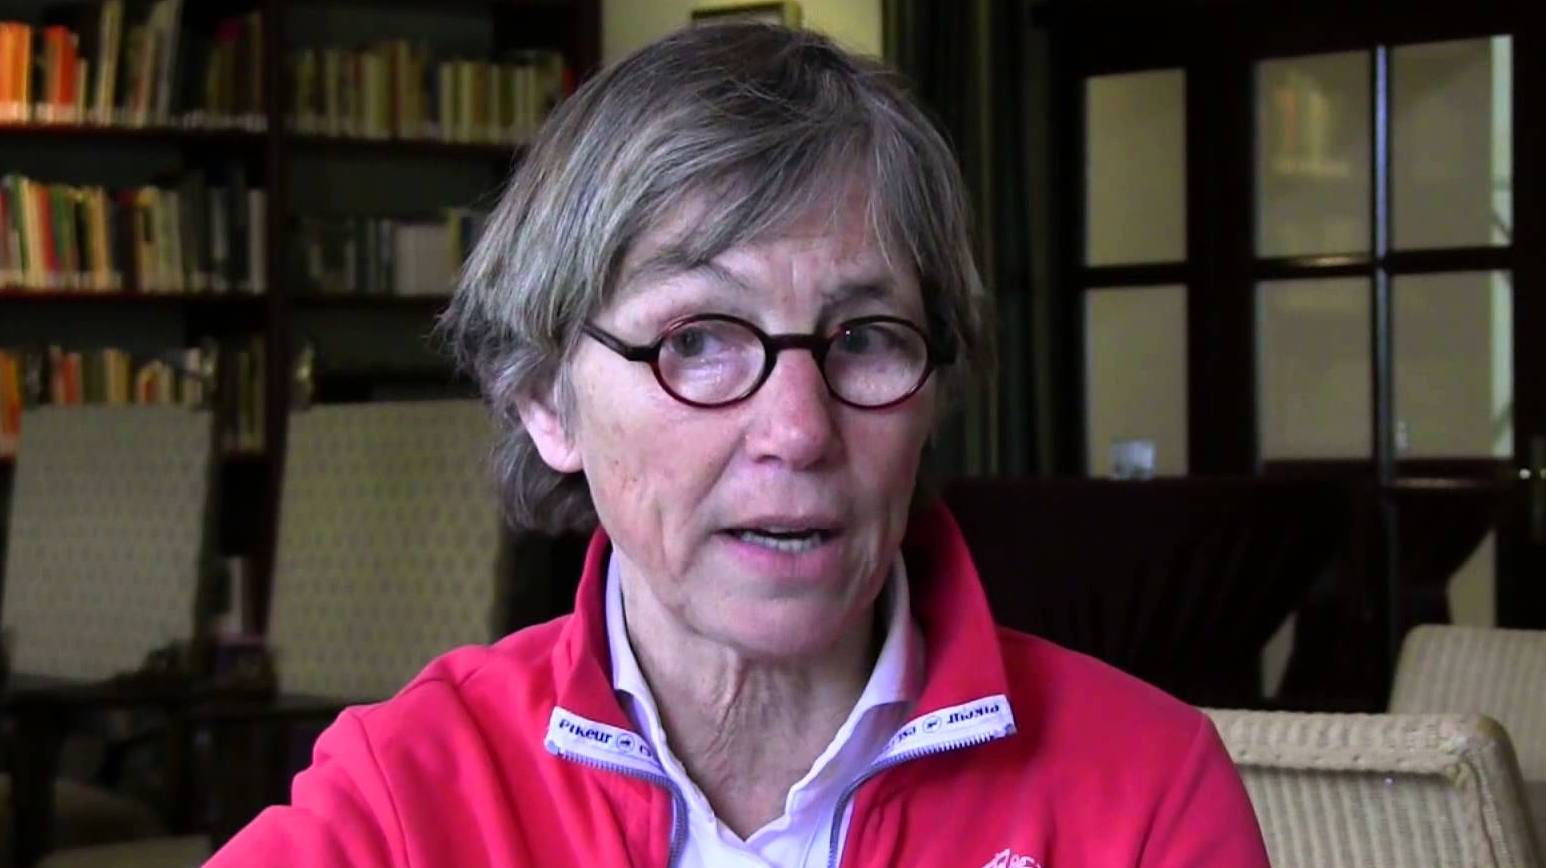 Tineke Bartels stopt als bondscoach jeugdruiters